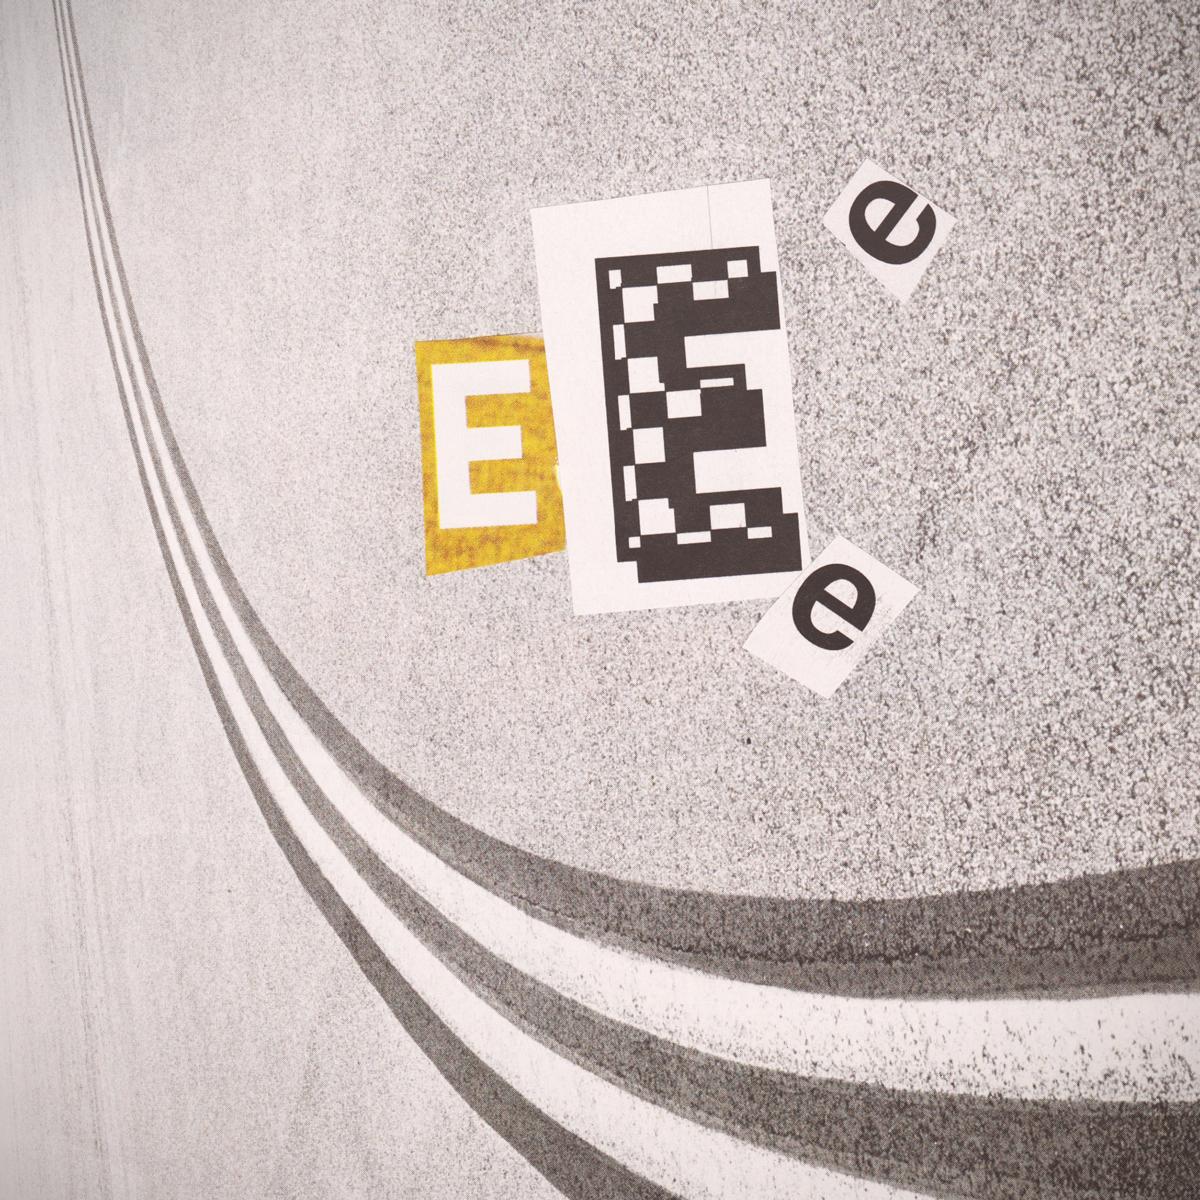 e_.jpg